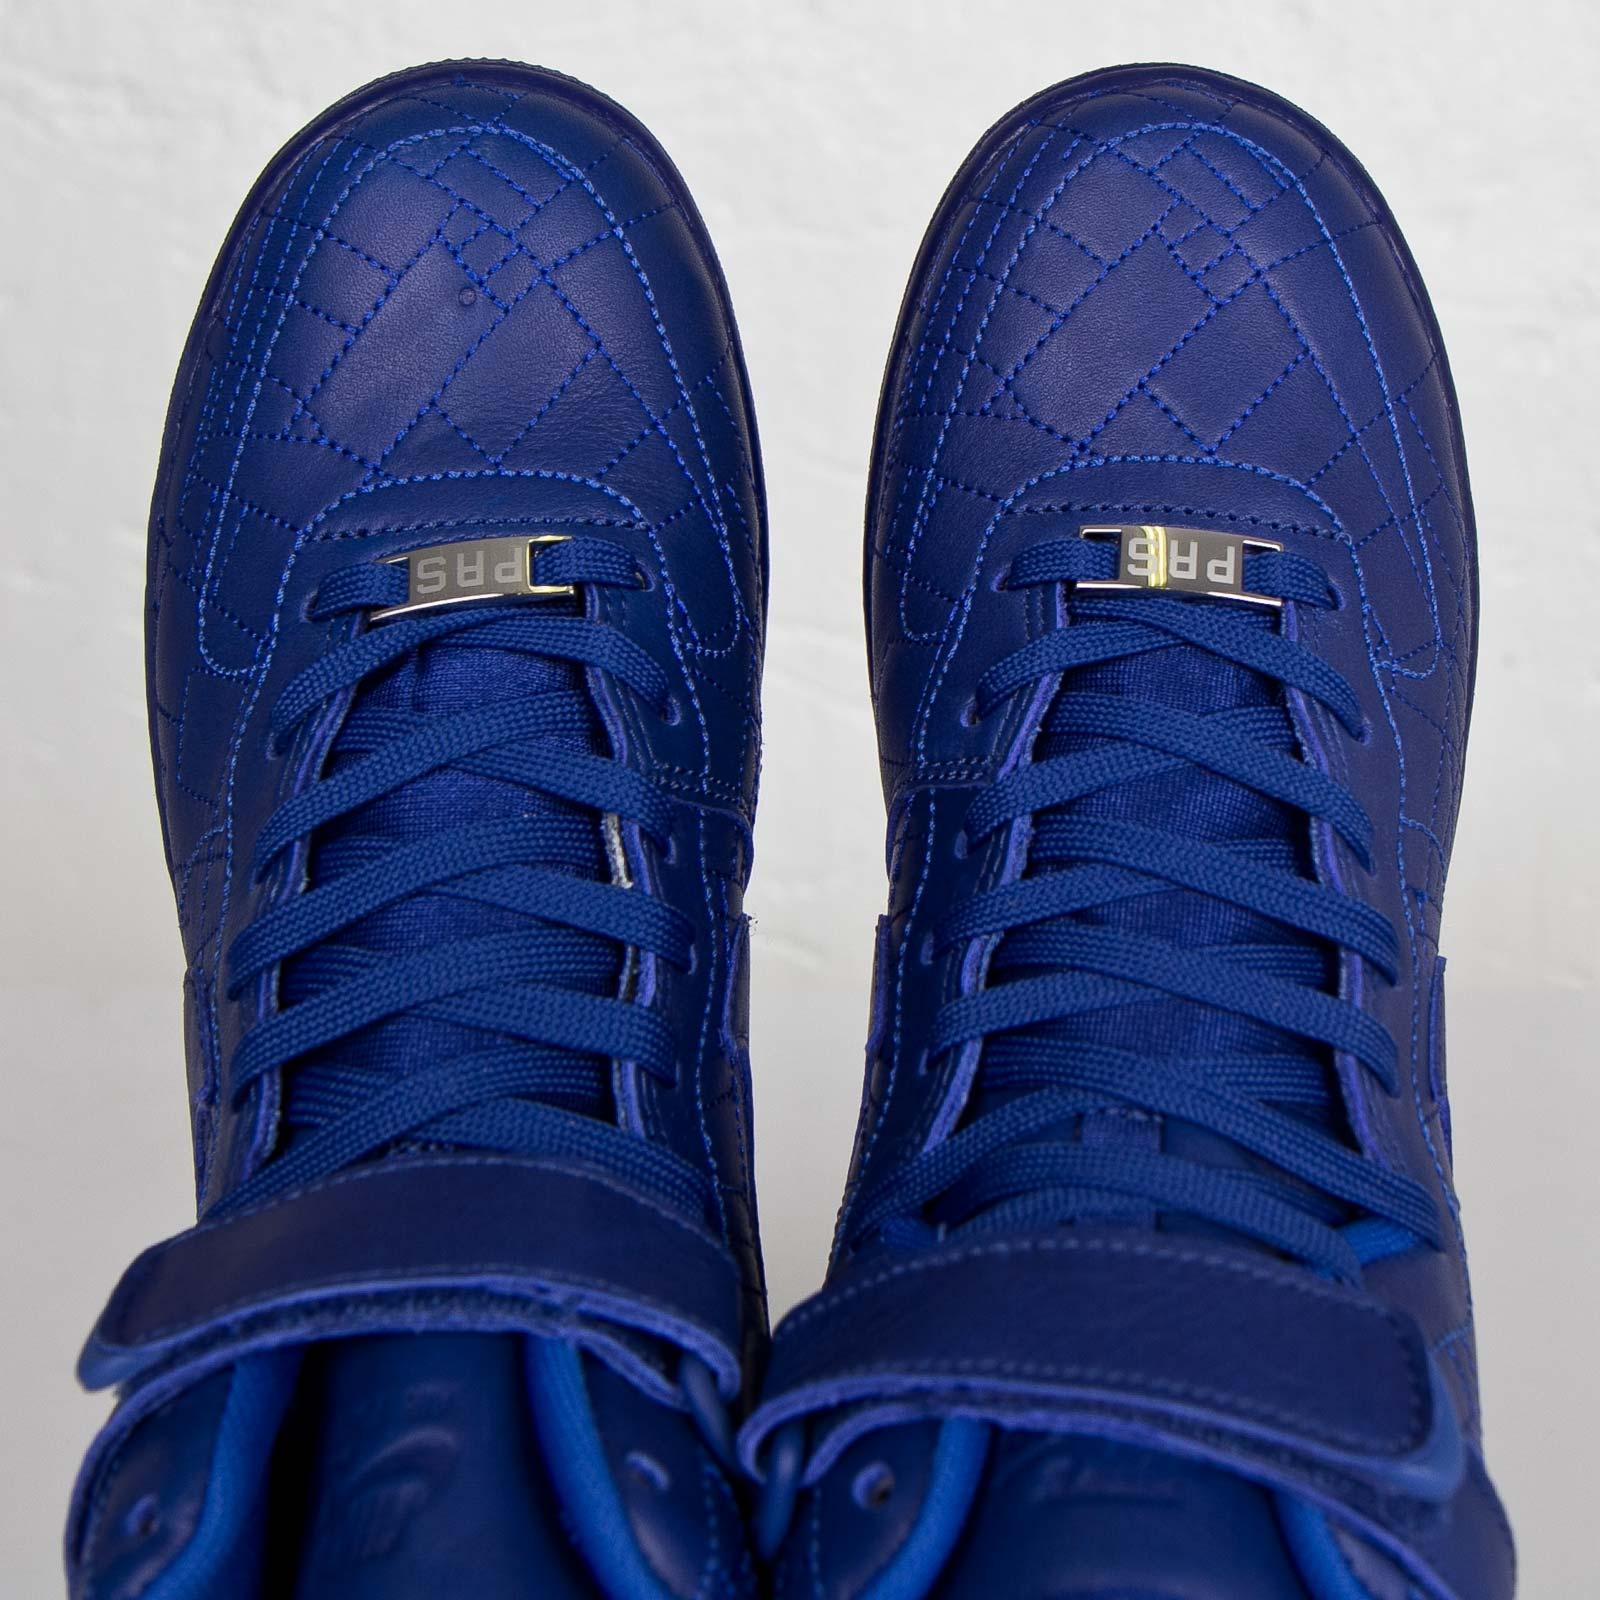 Nike Wmns Air Force 1 Hi Fw Qs 704010 400